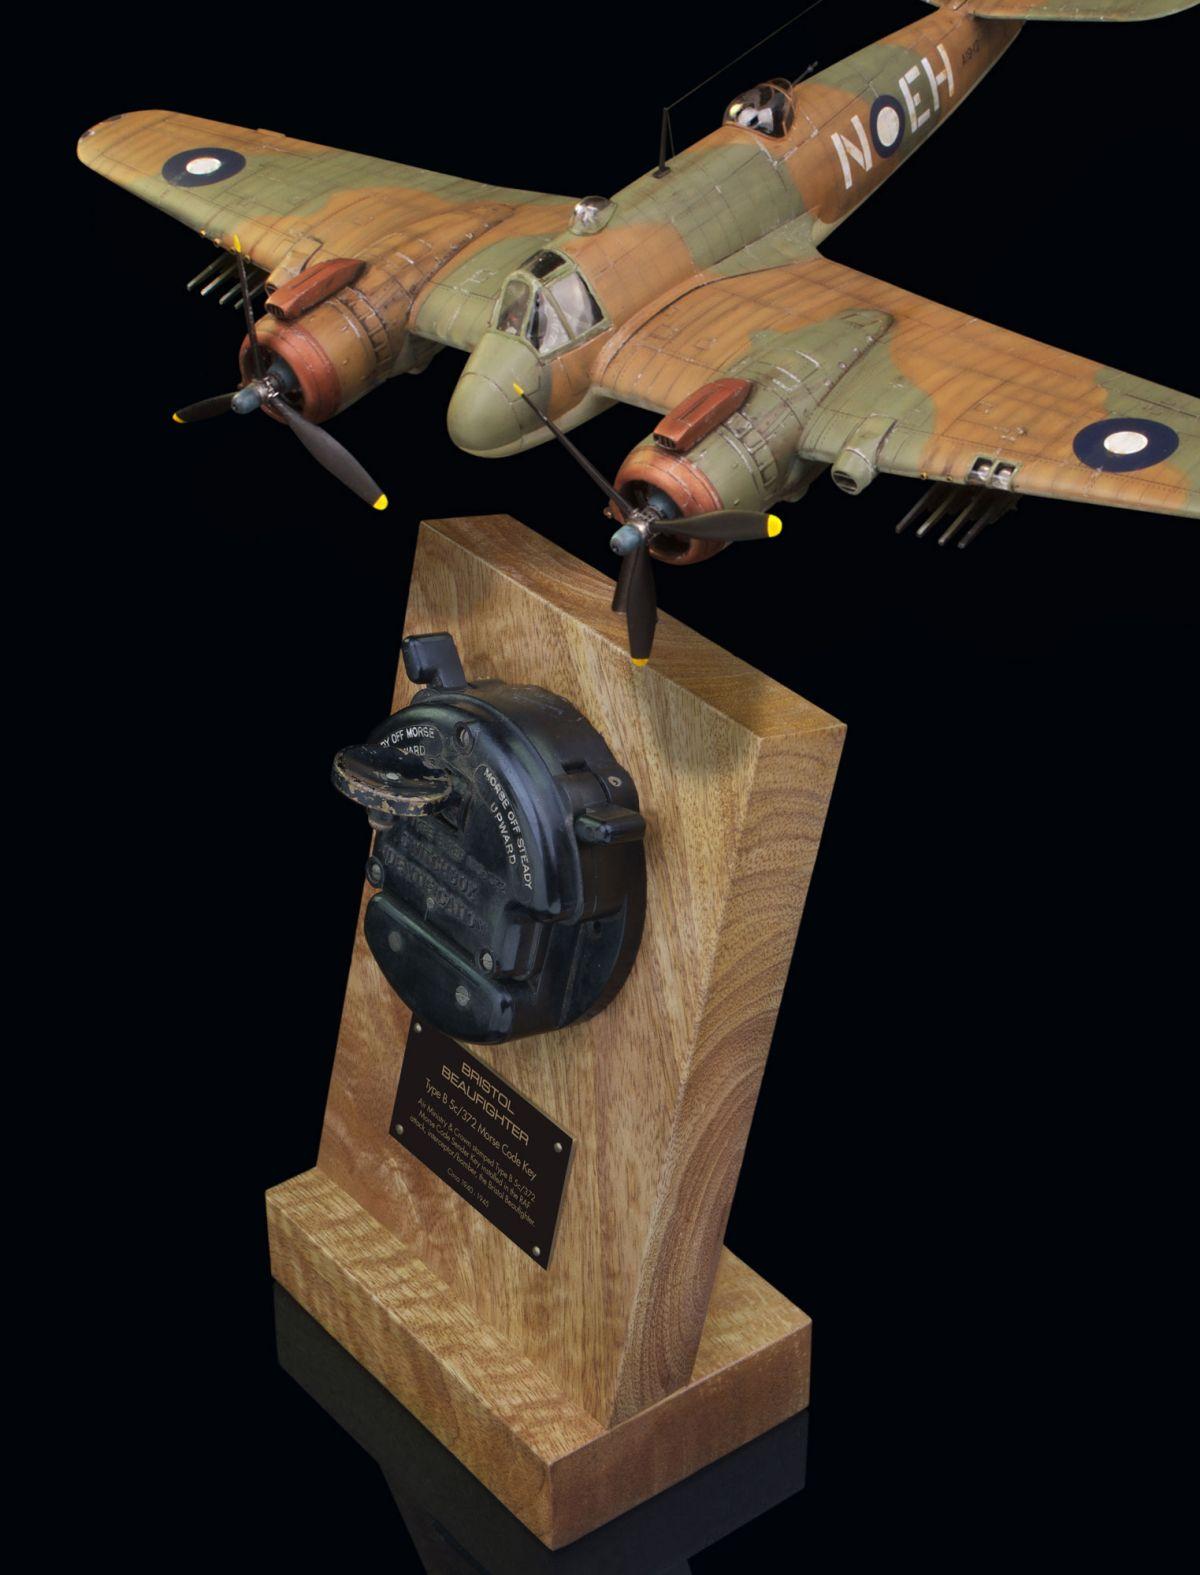 BRISTOL BEAUFIGHTER TYPE B, 5c/373 AIR MINISTRY & CROWN STAMPED MORSE CODE SENDER KEY